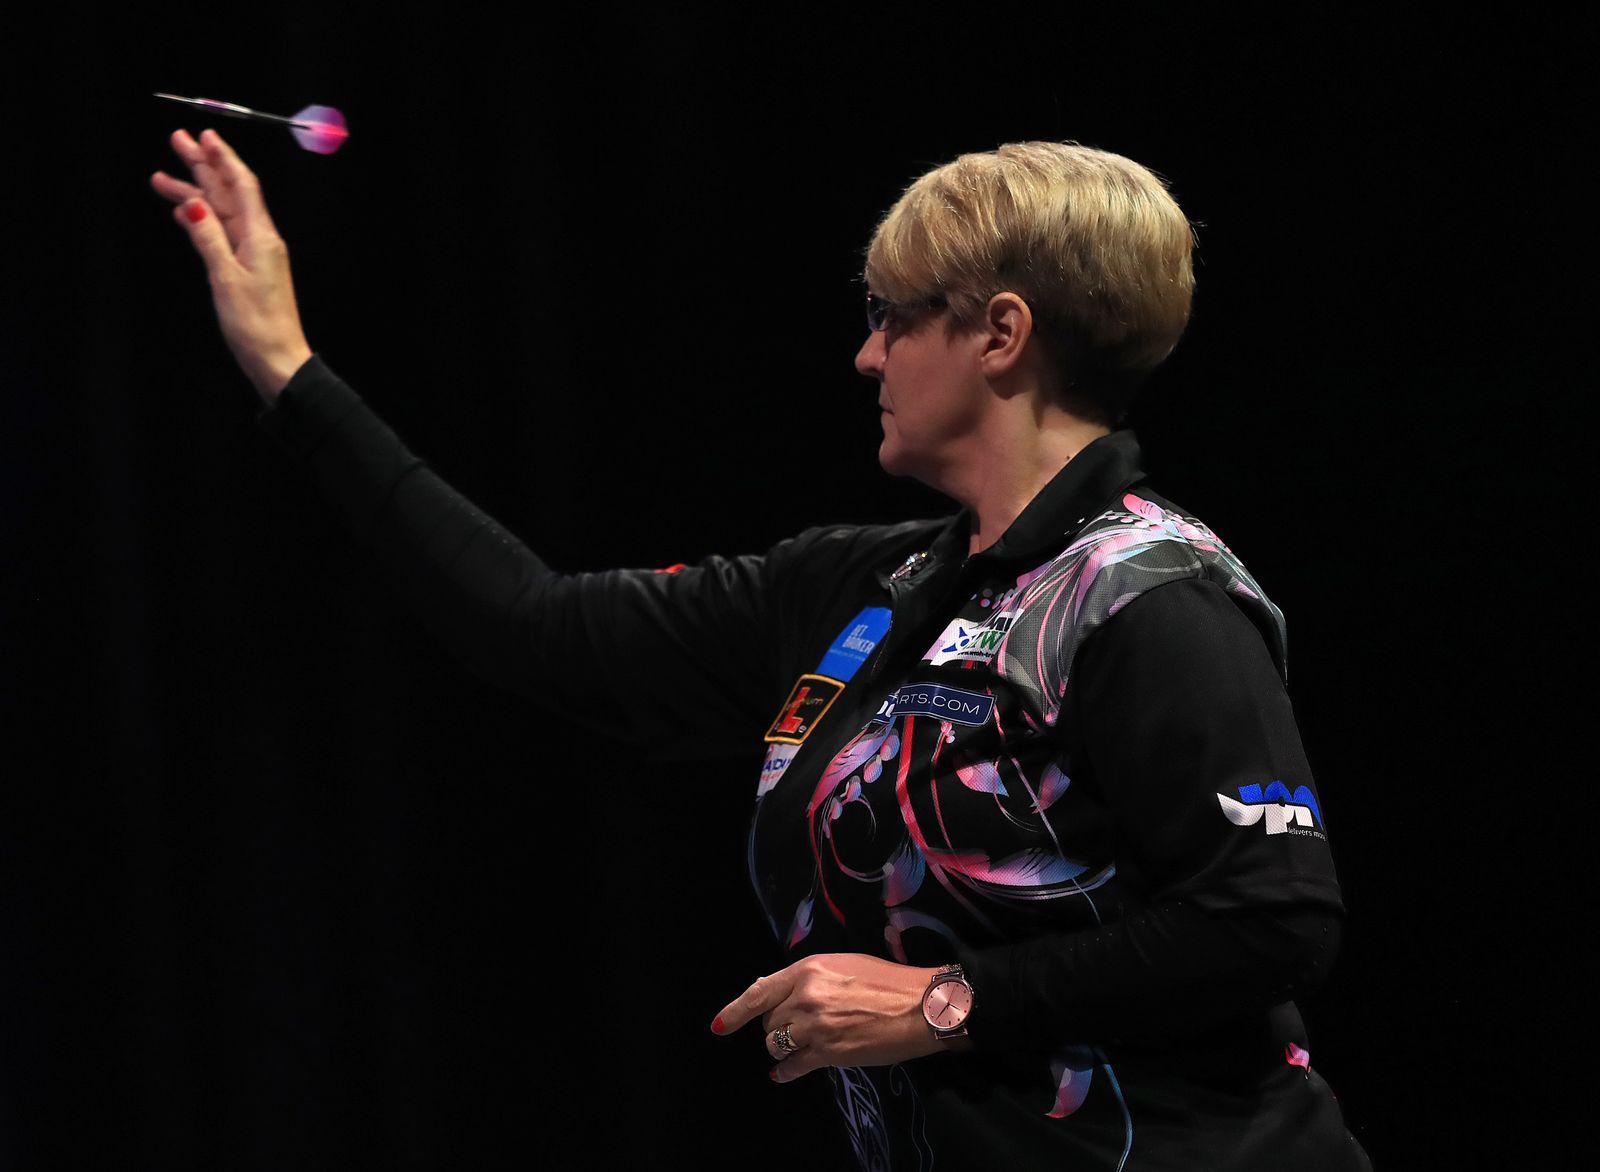 2020 BDO World Professional Darts Championships - Day Eight - The